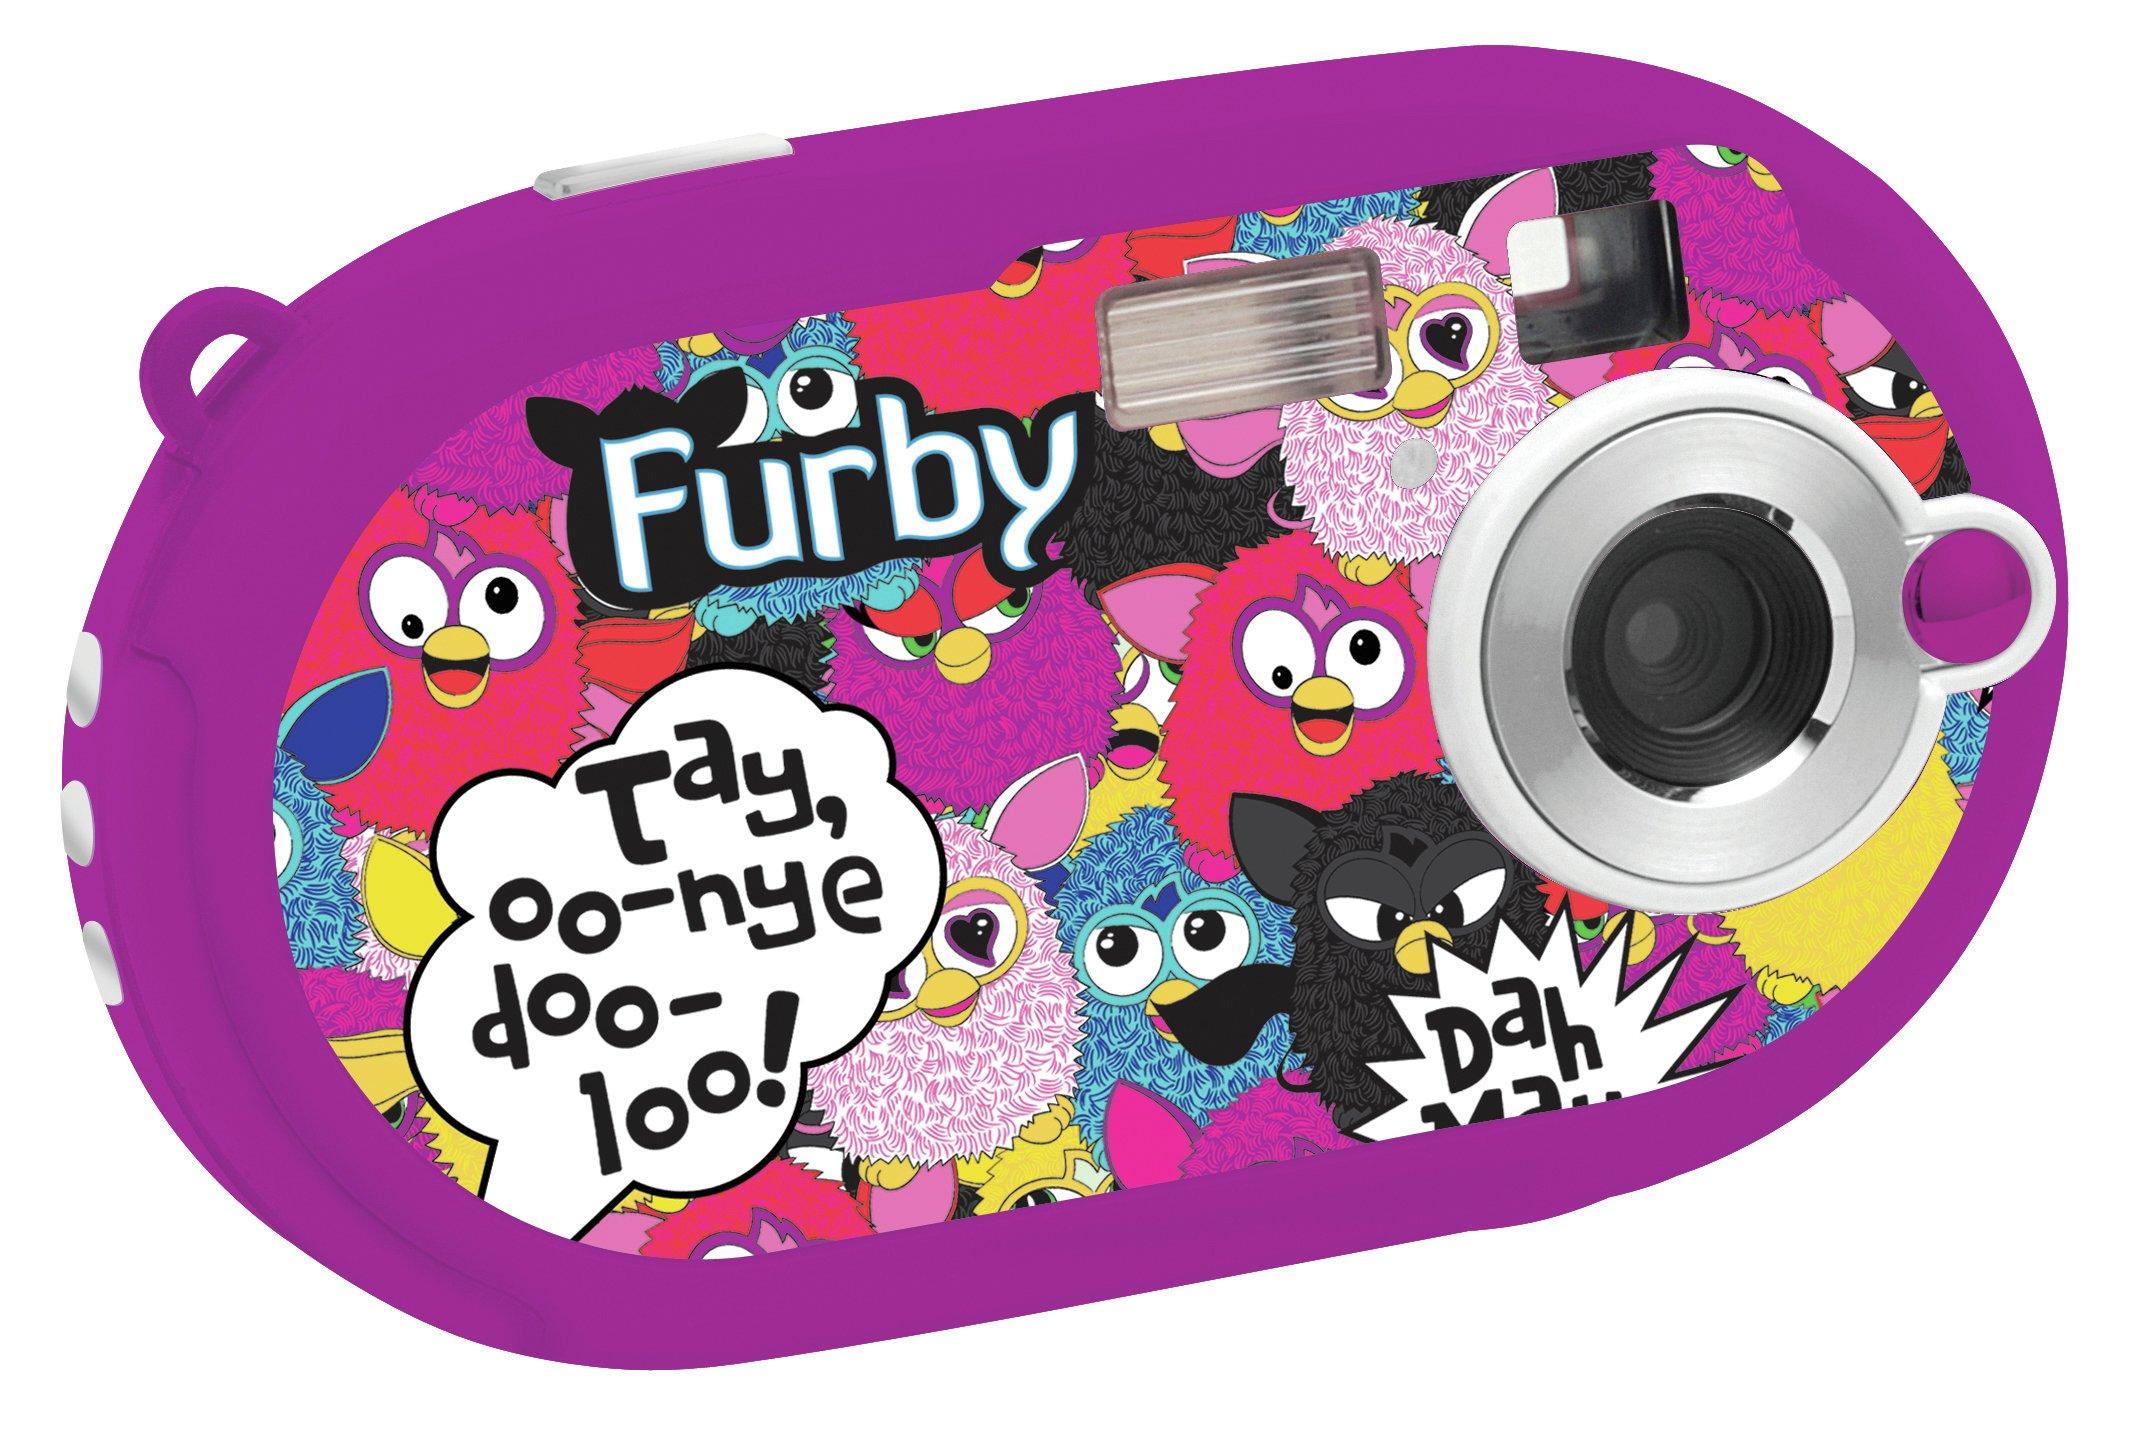 furby-5mp-digital-camera